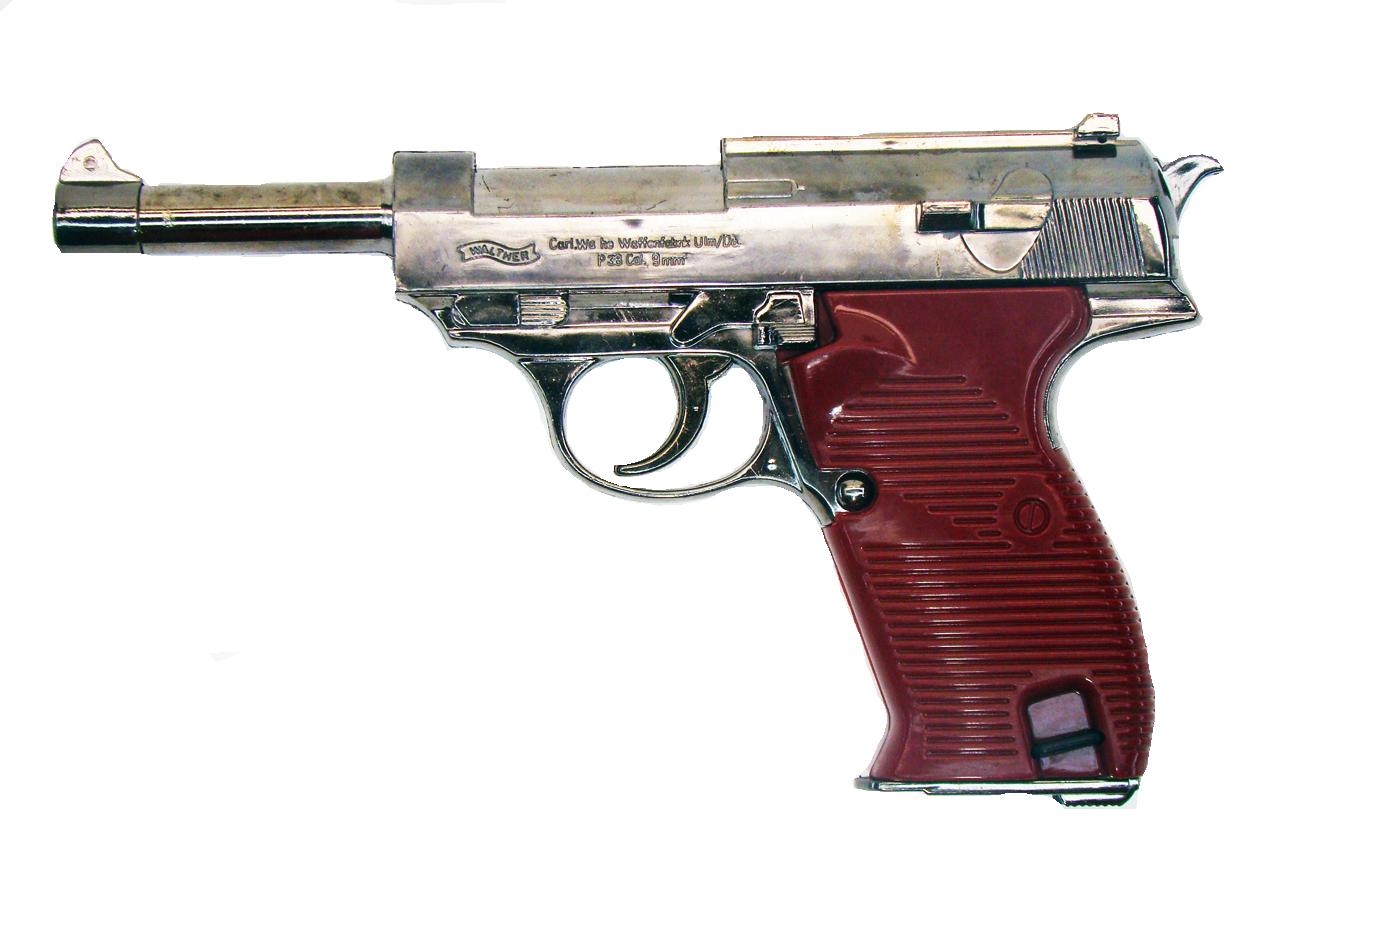 Зажигалка в виде пистолета Walther P38